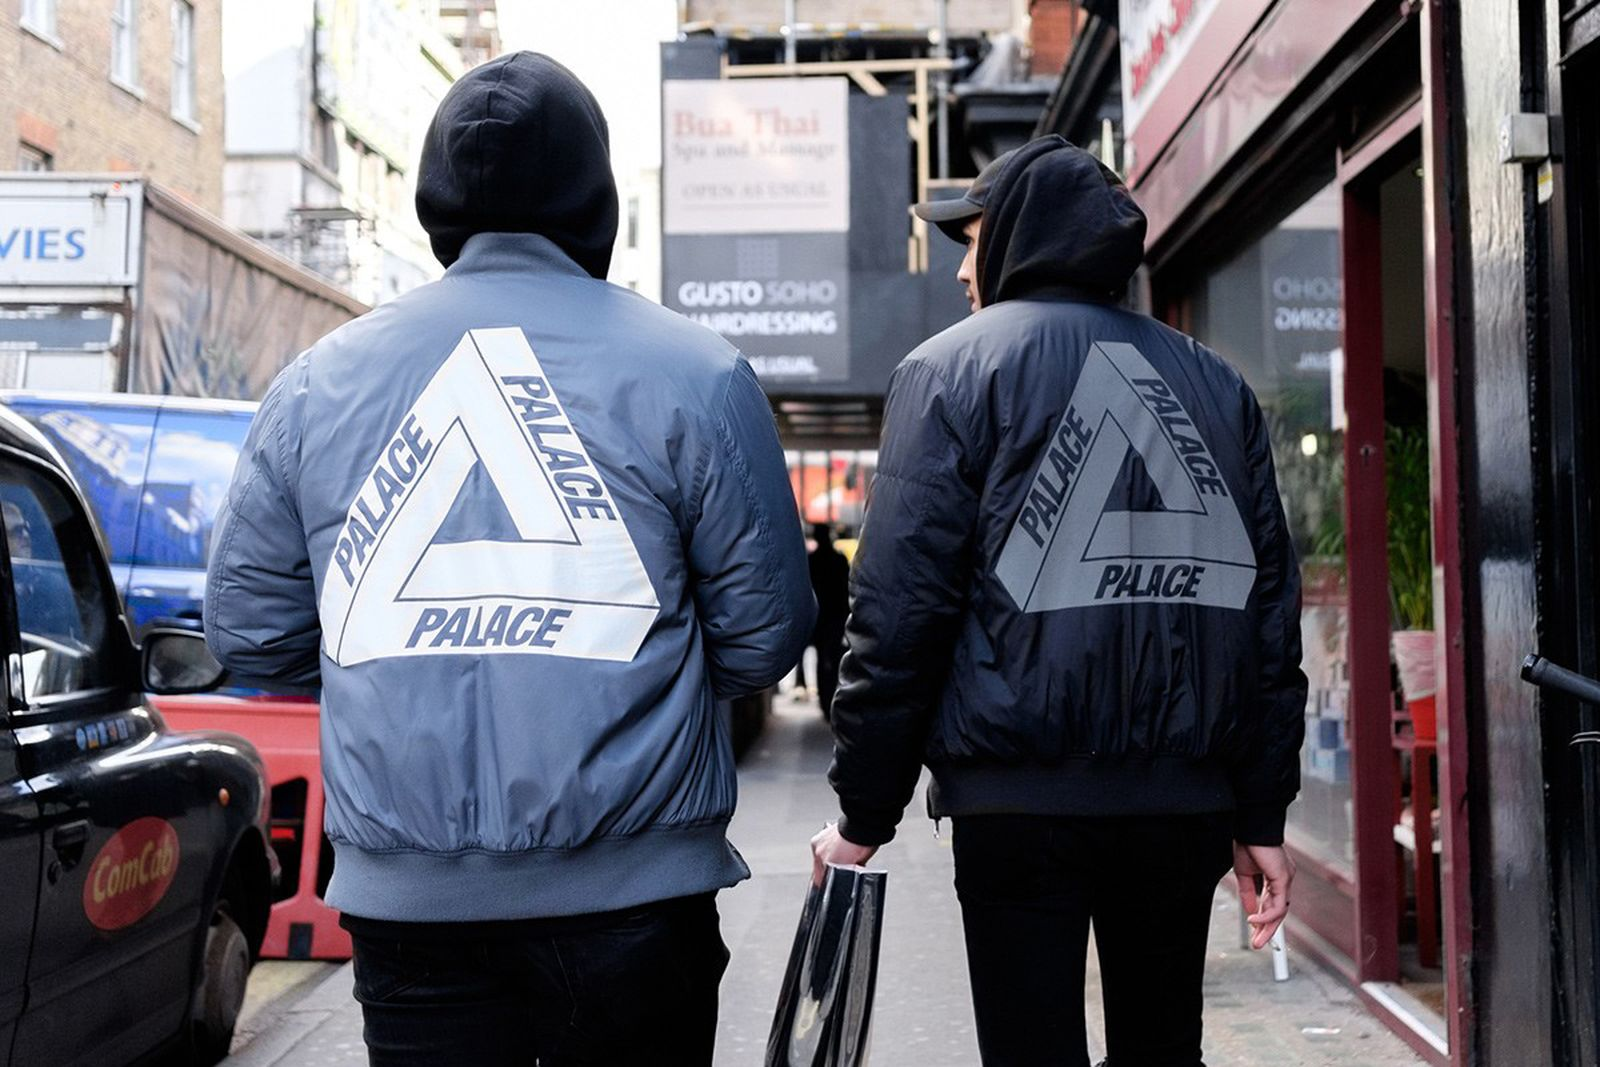 Palace jackets